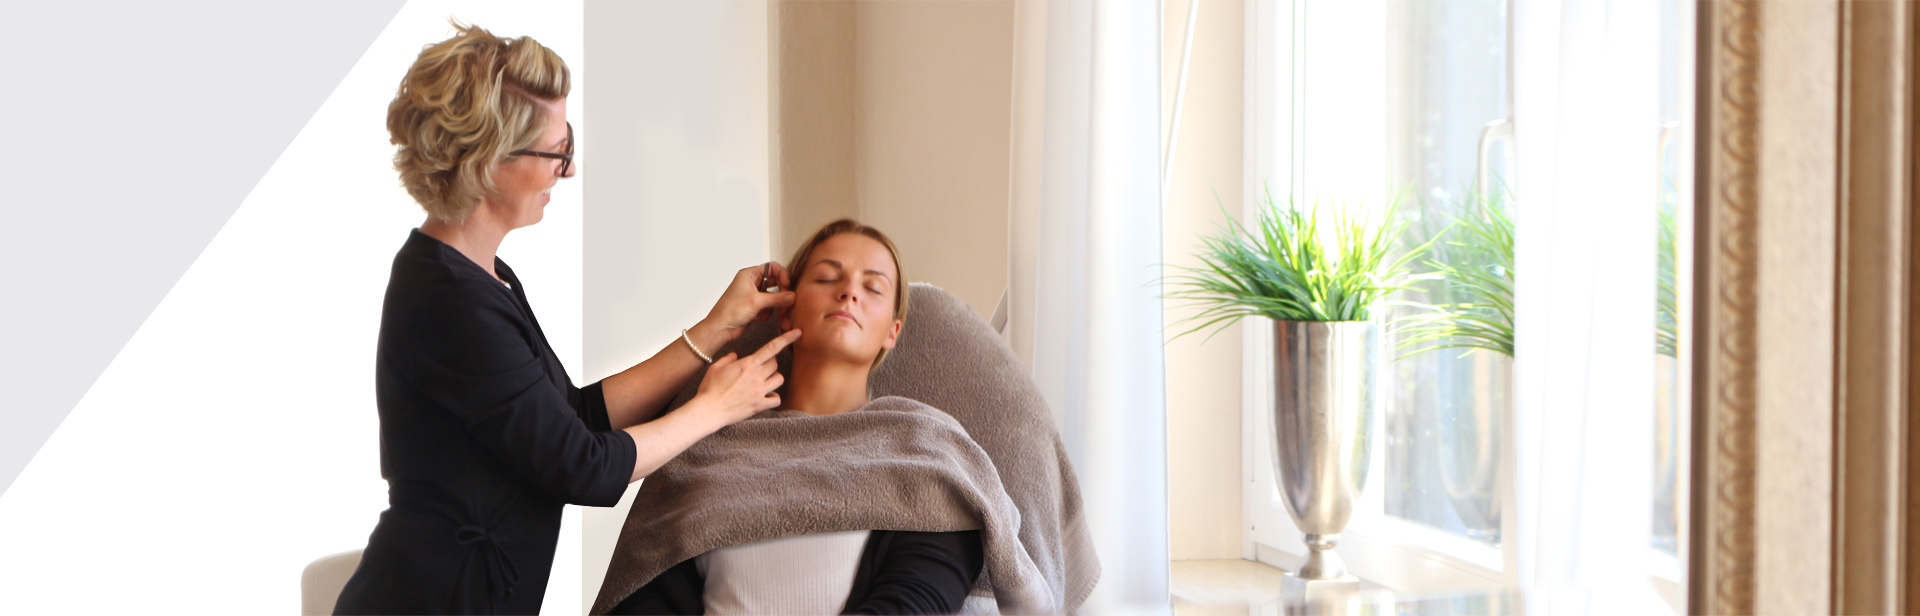 Kosmetik-Atelier-Stolberg-Hameln-Slider